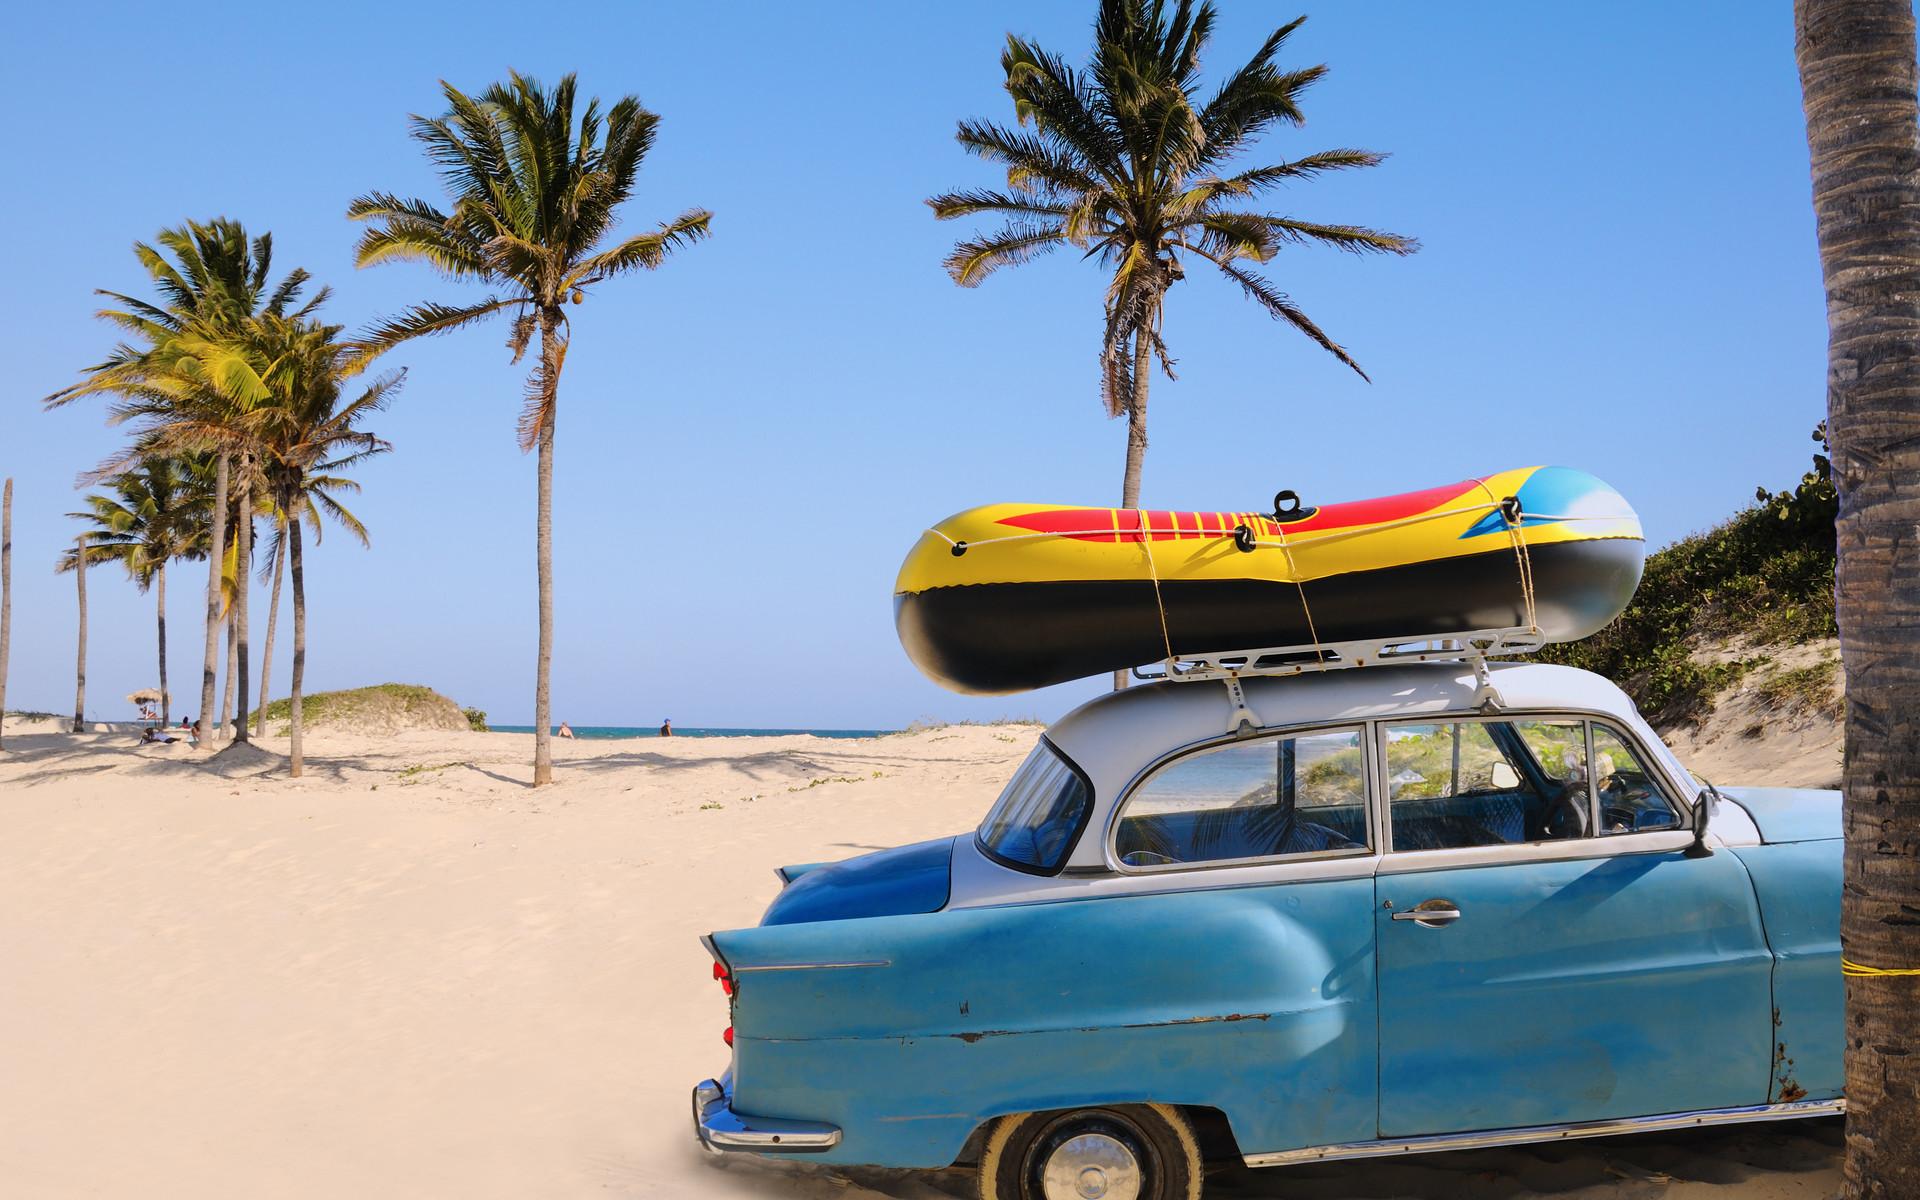 BEACH CHRISTMAS | vacation wallpaper holiday, travel, beach, car, boat, palm